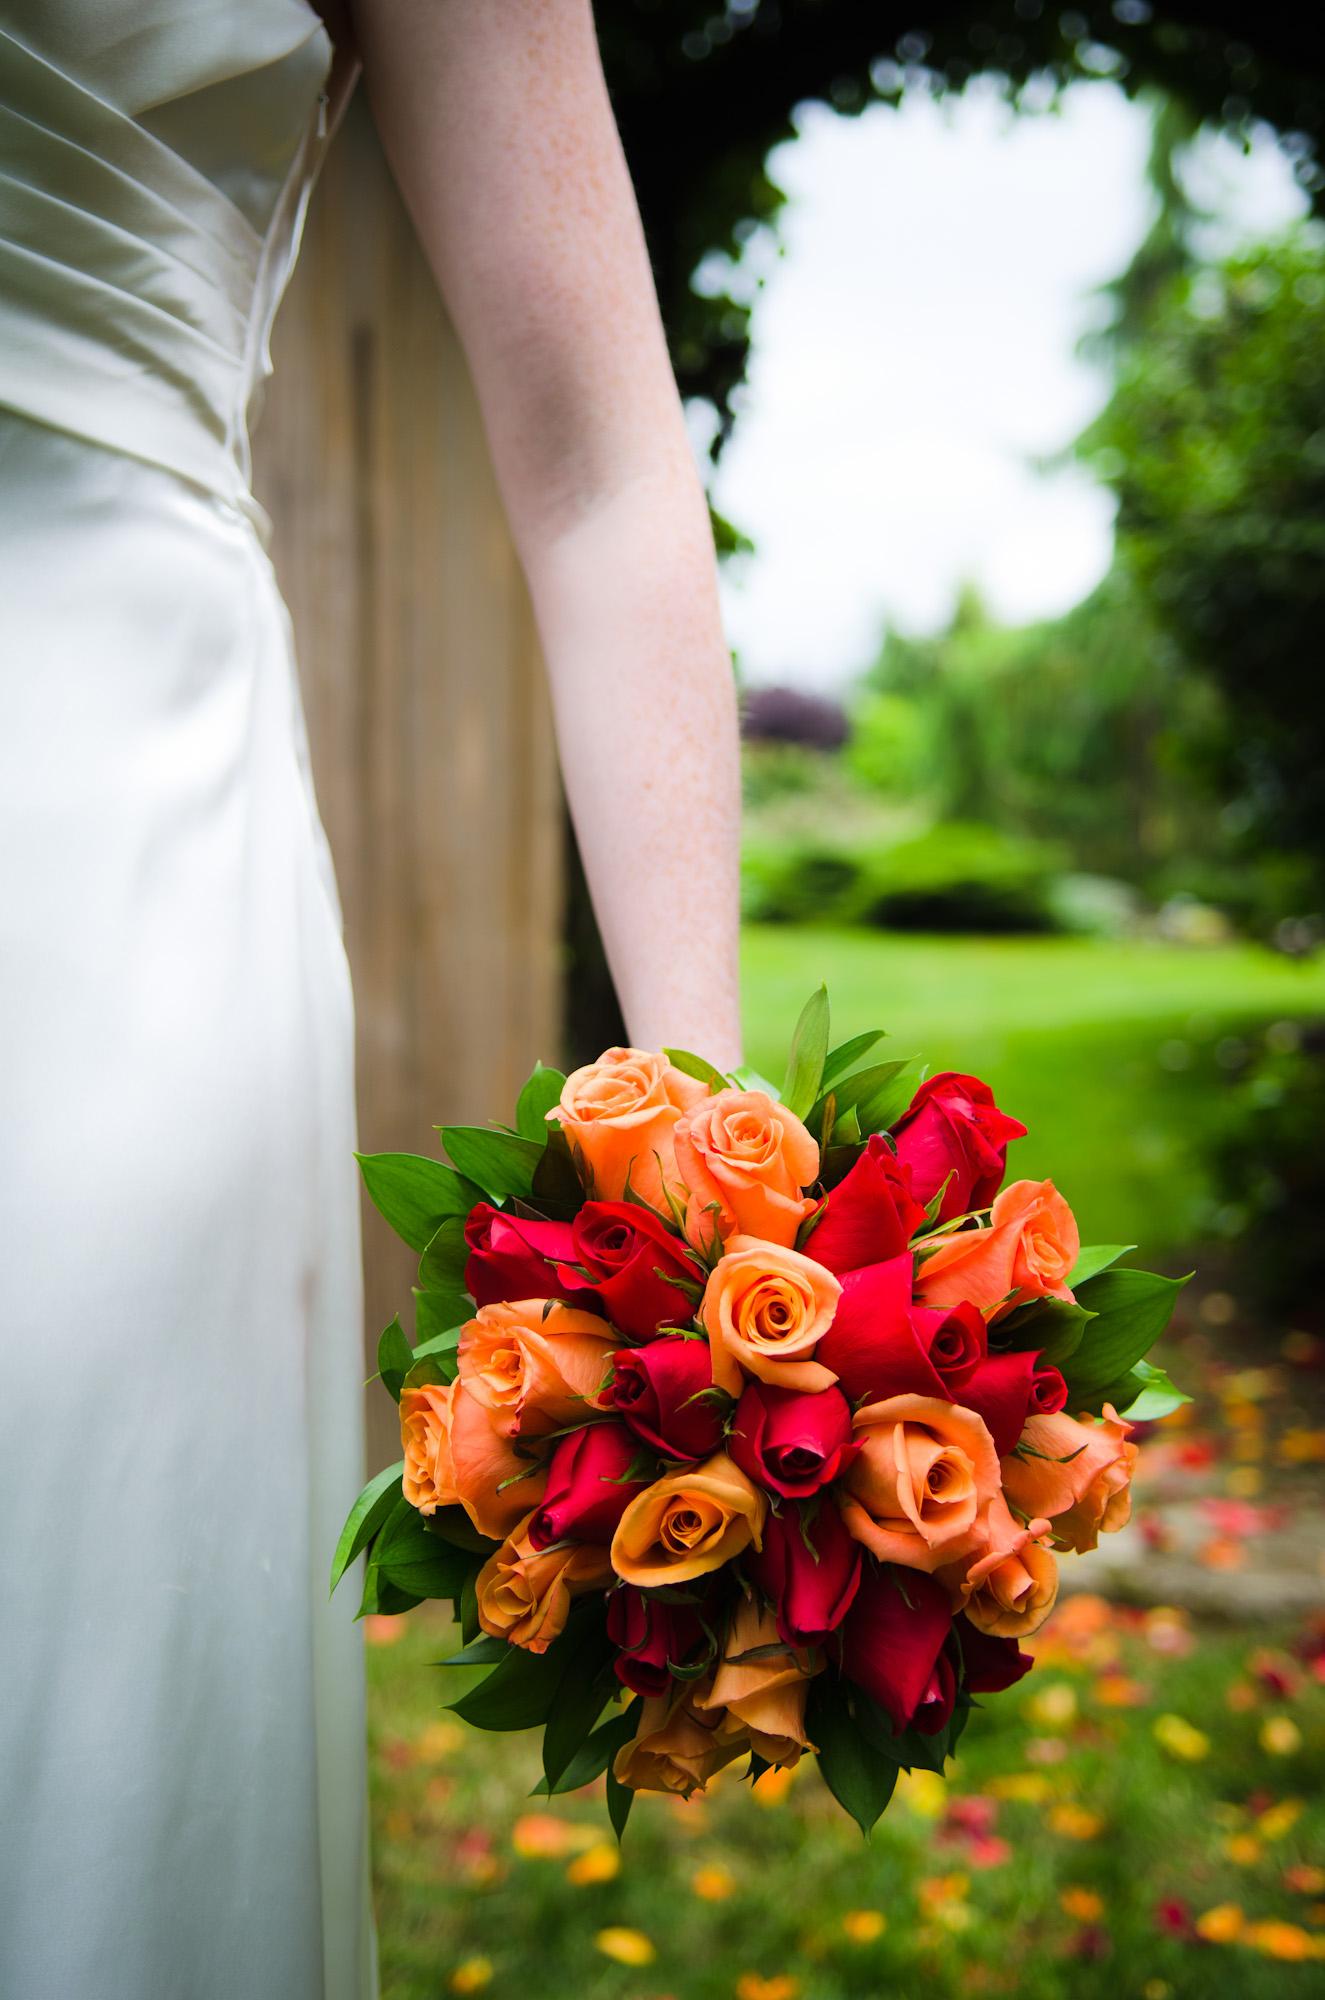 bouquet_7819475178_o.jpg